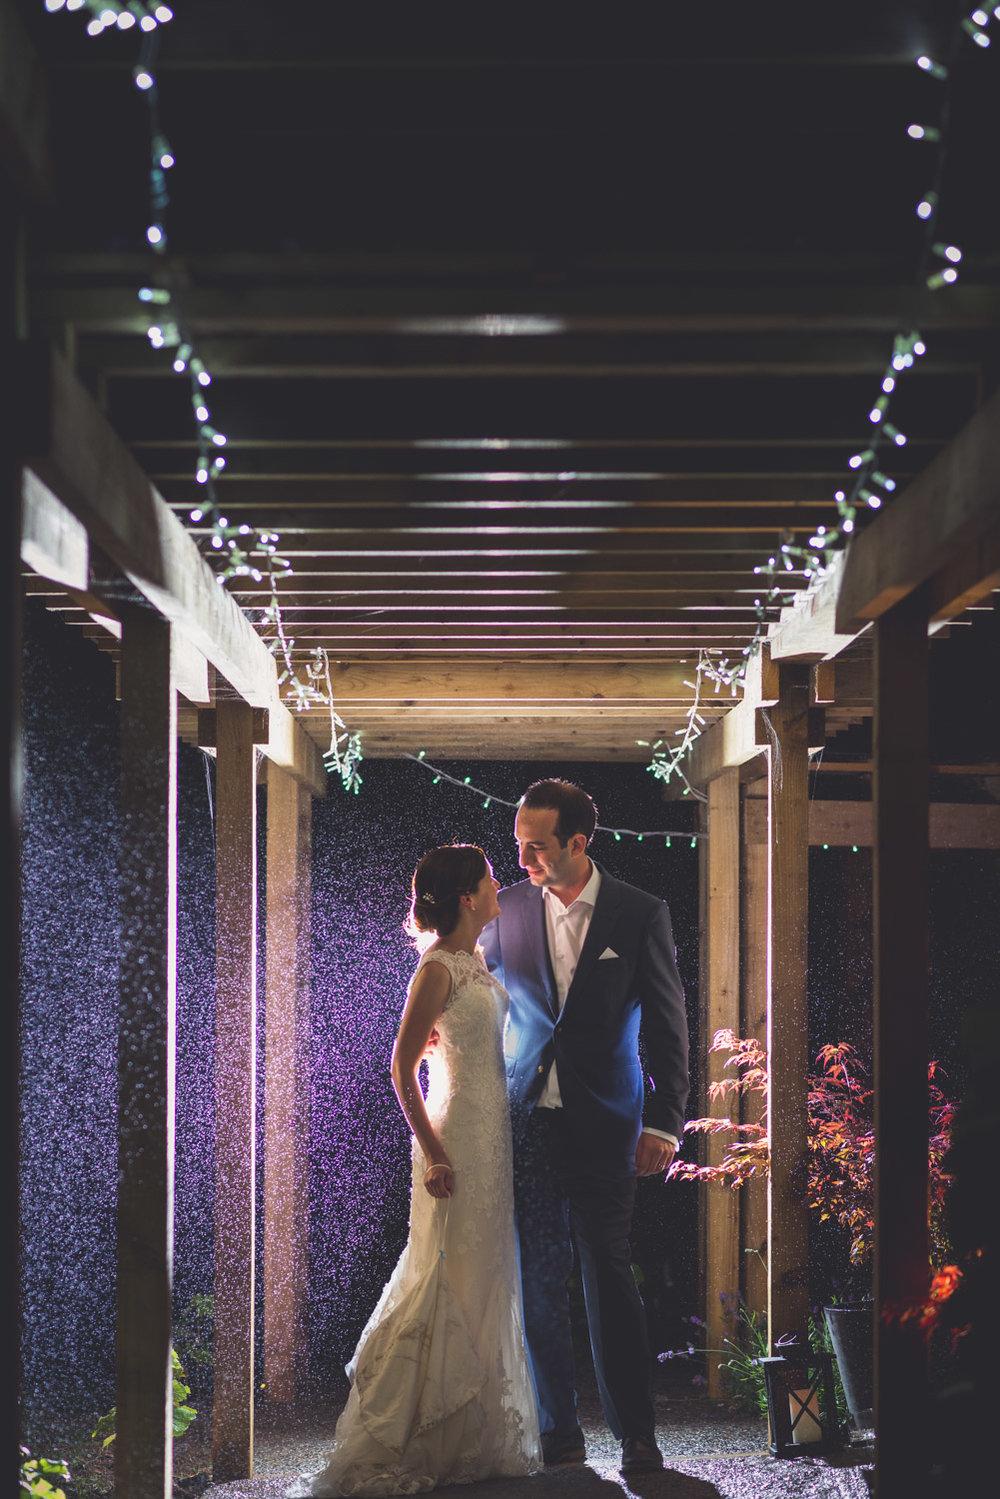 Anran wedding photography / Helen & Paul